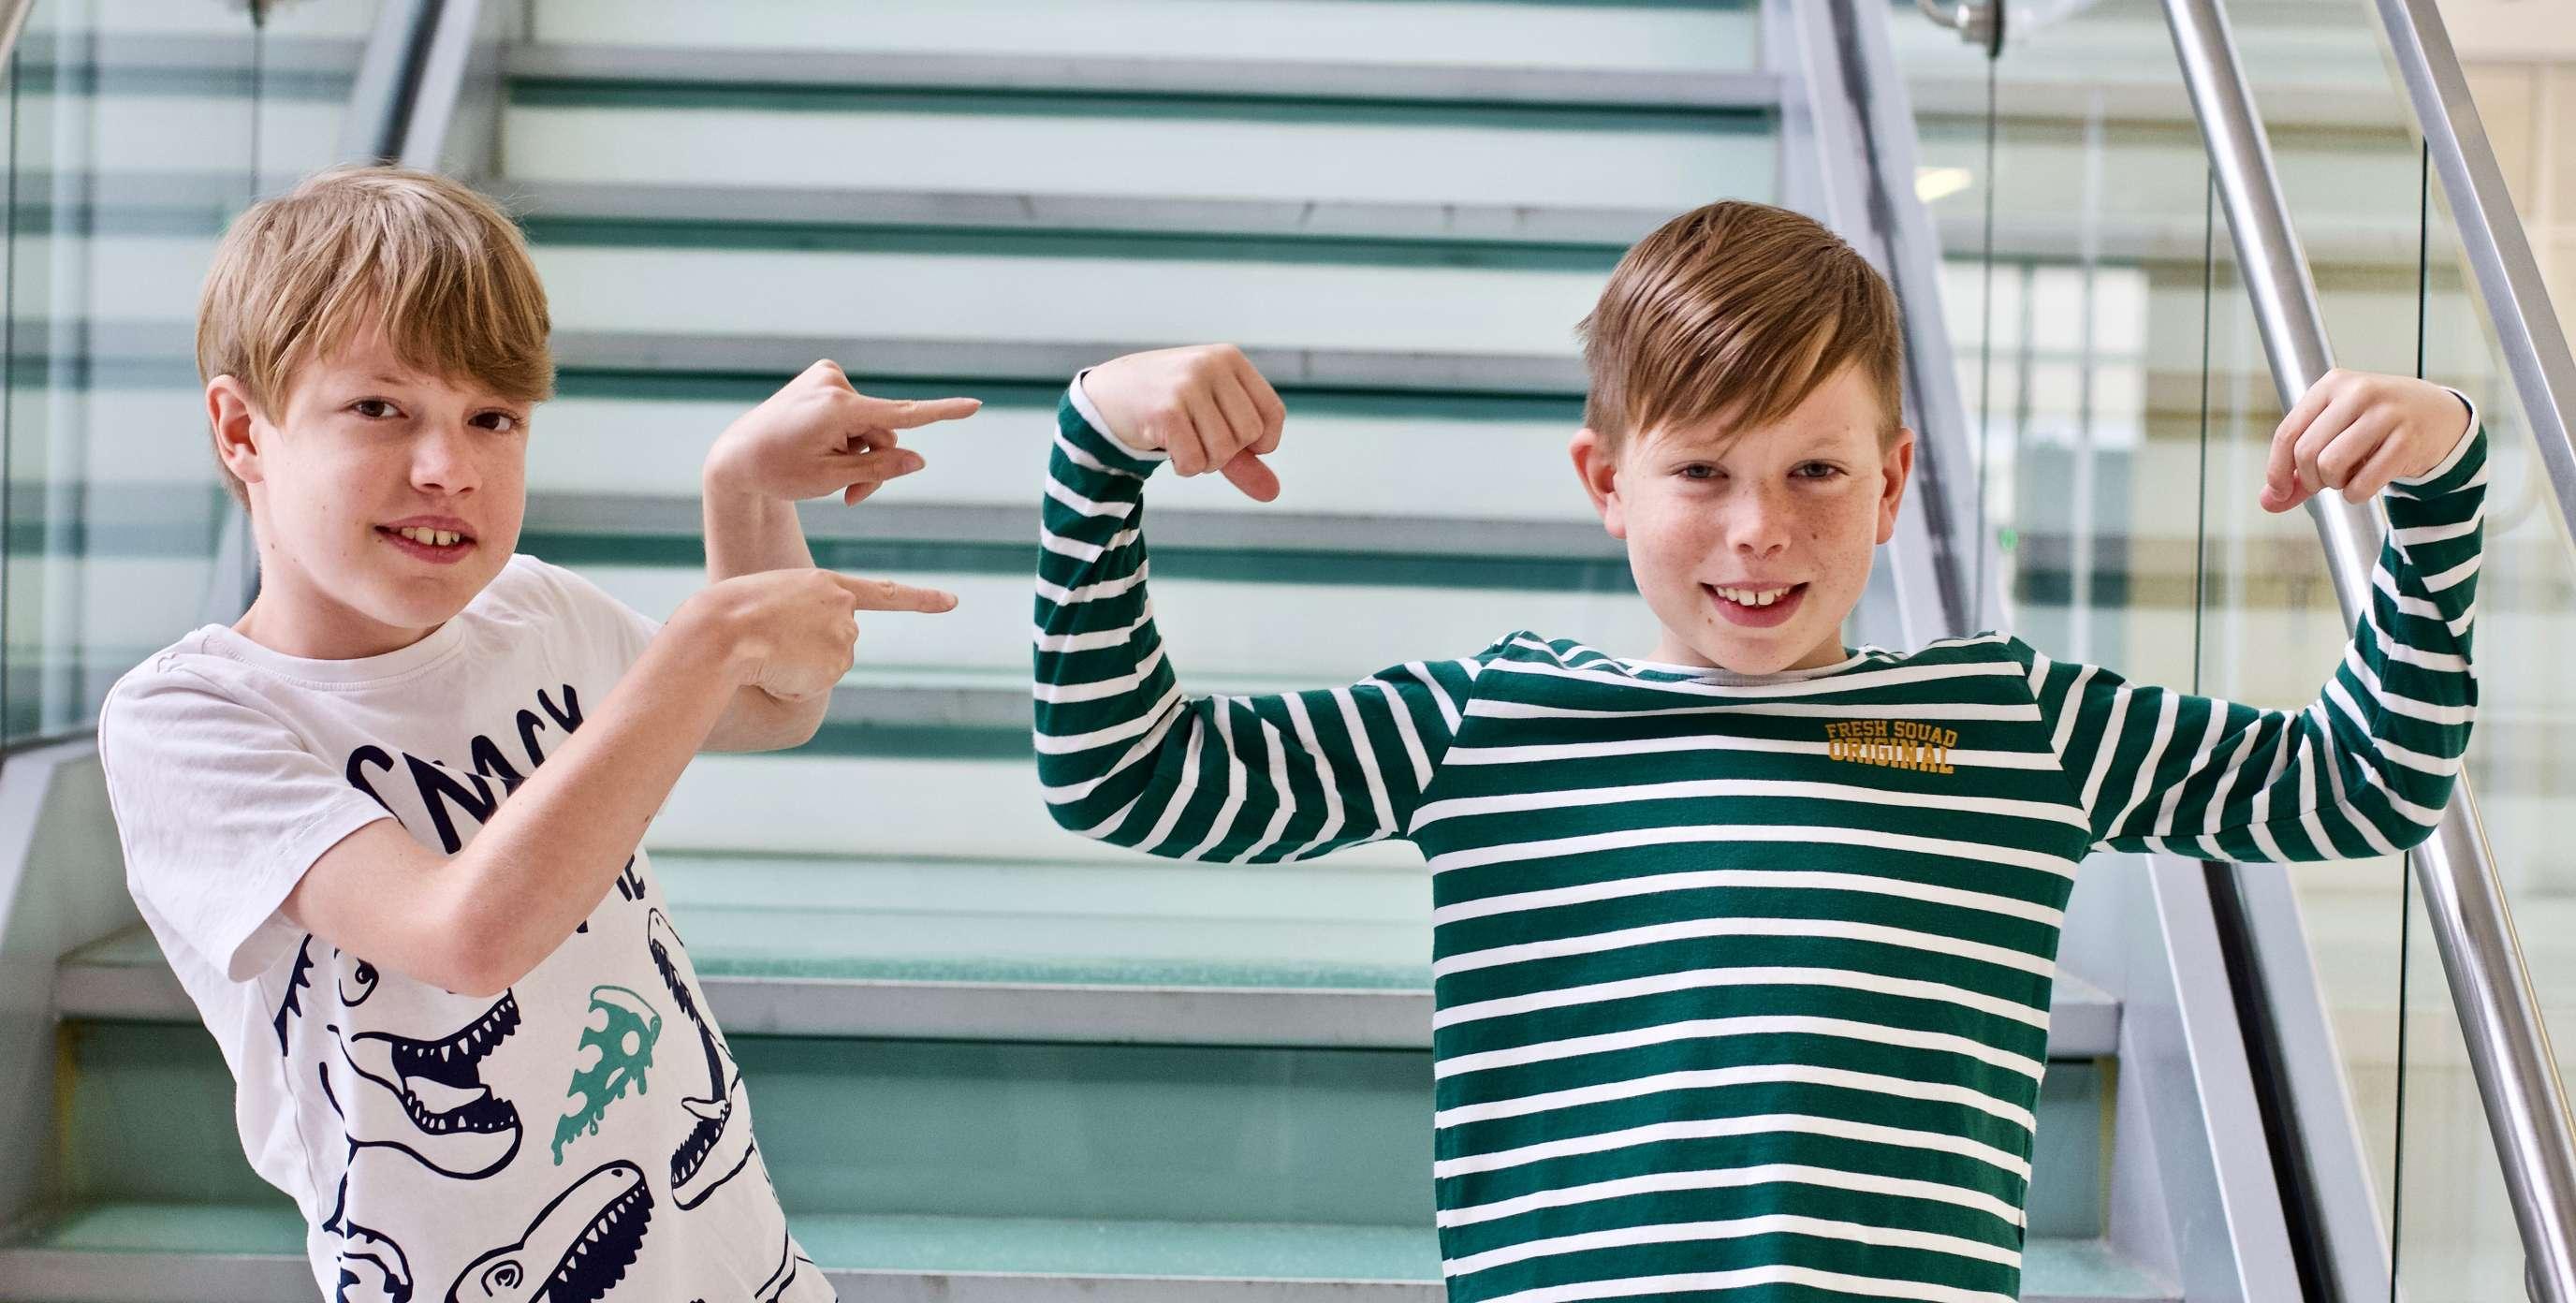 Misko and Jonas